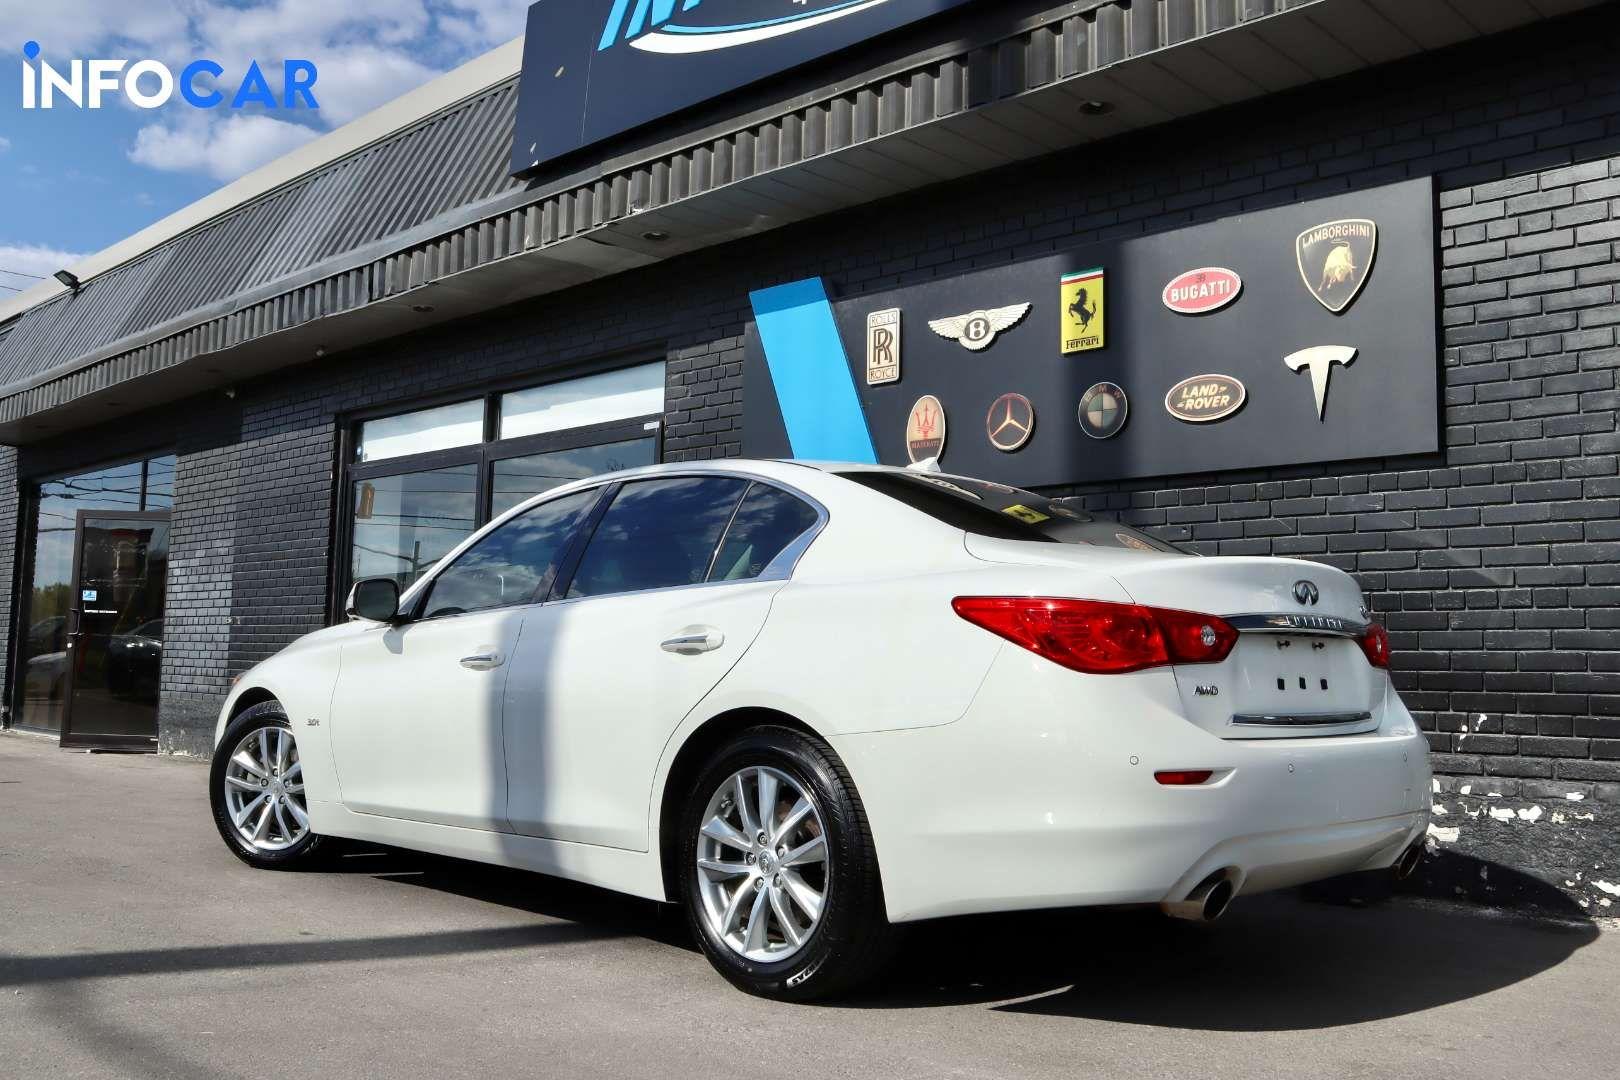 2017 Infiniti Q50 Premium - INFOCAR - Toronto's Most Comprehensive New and Used Auto Trading Platform